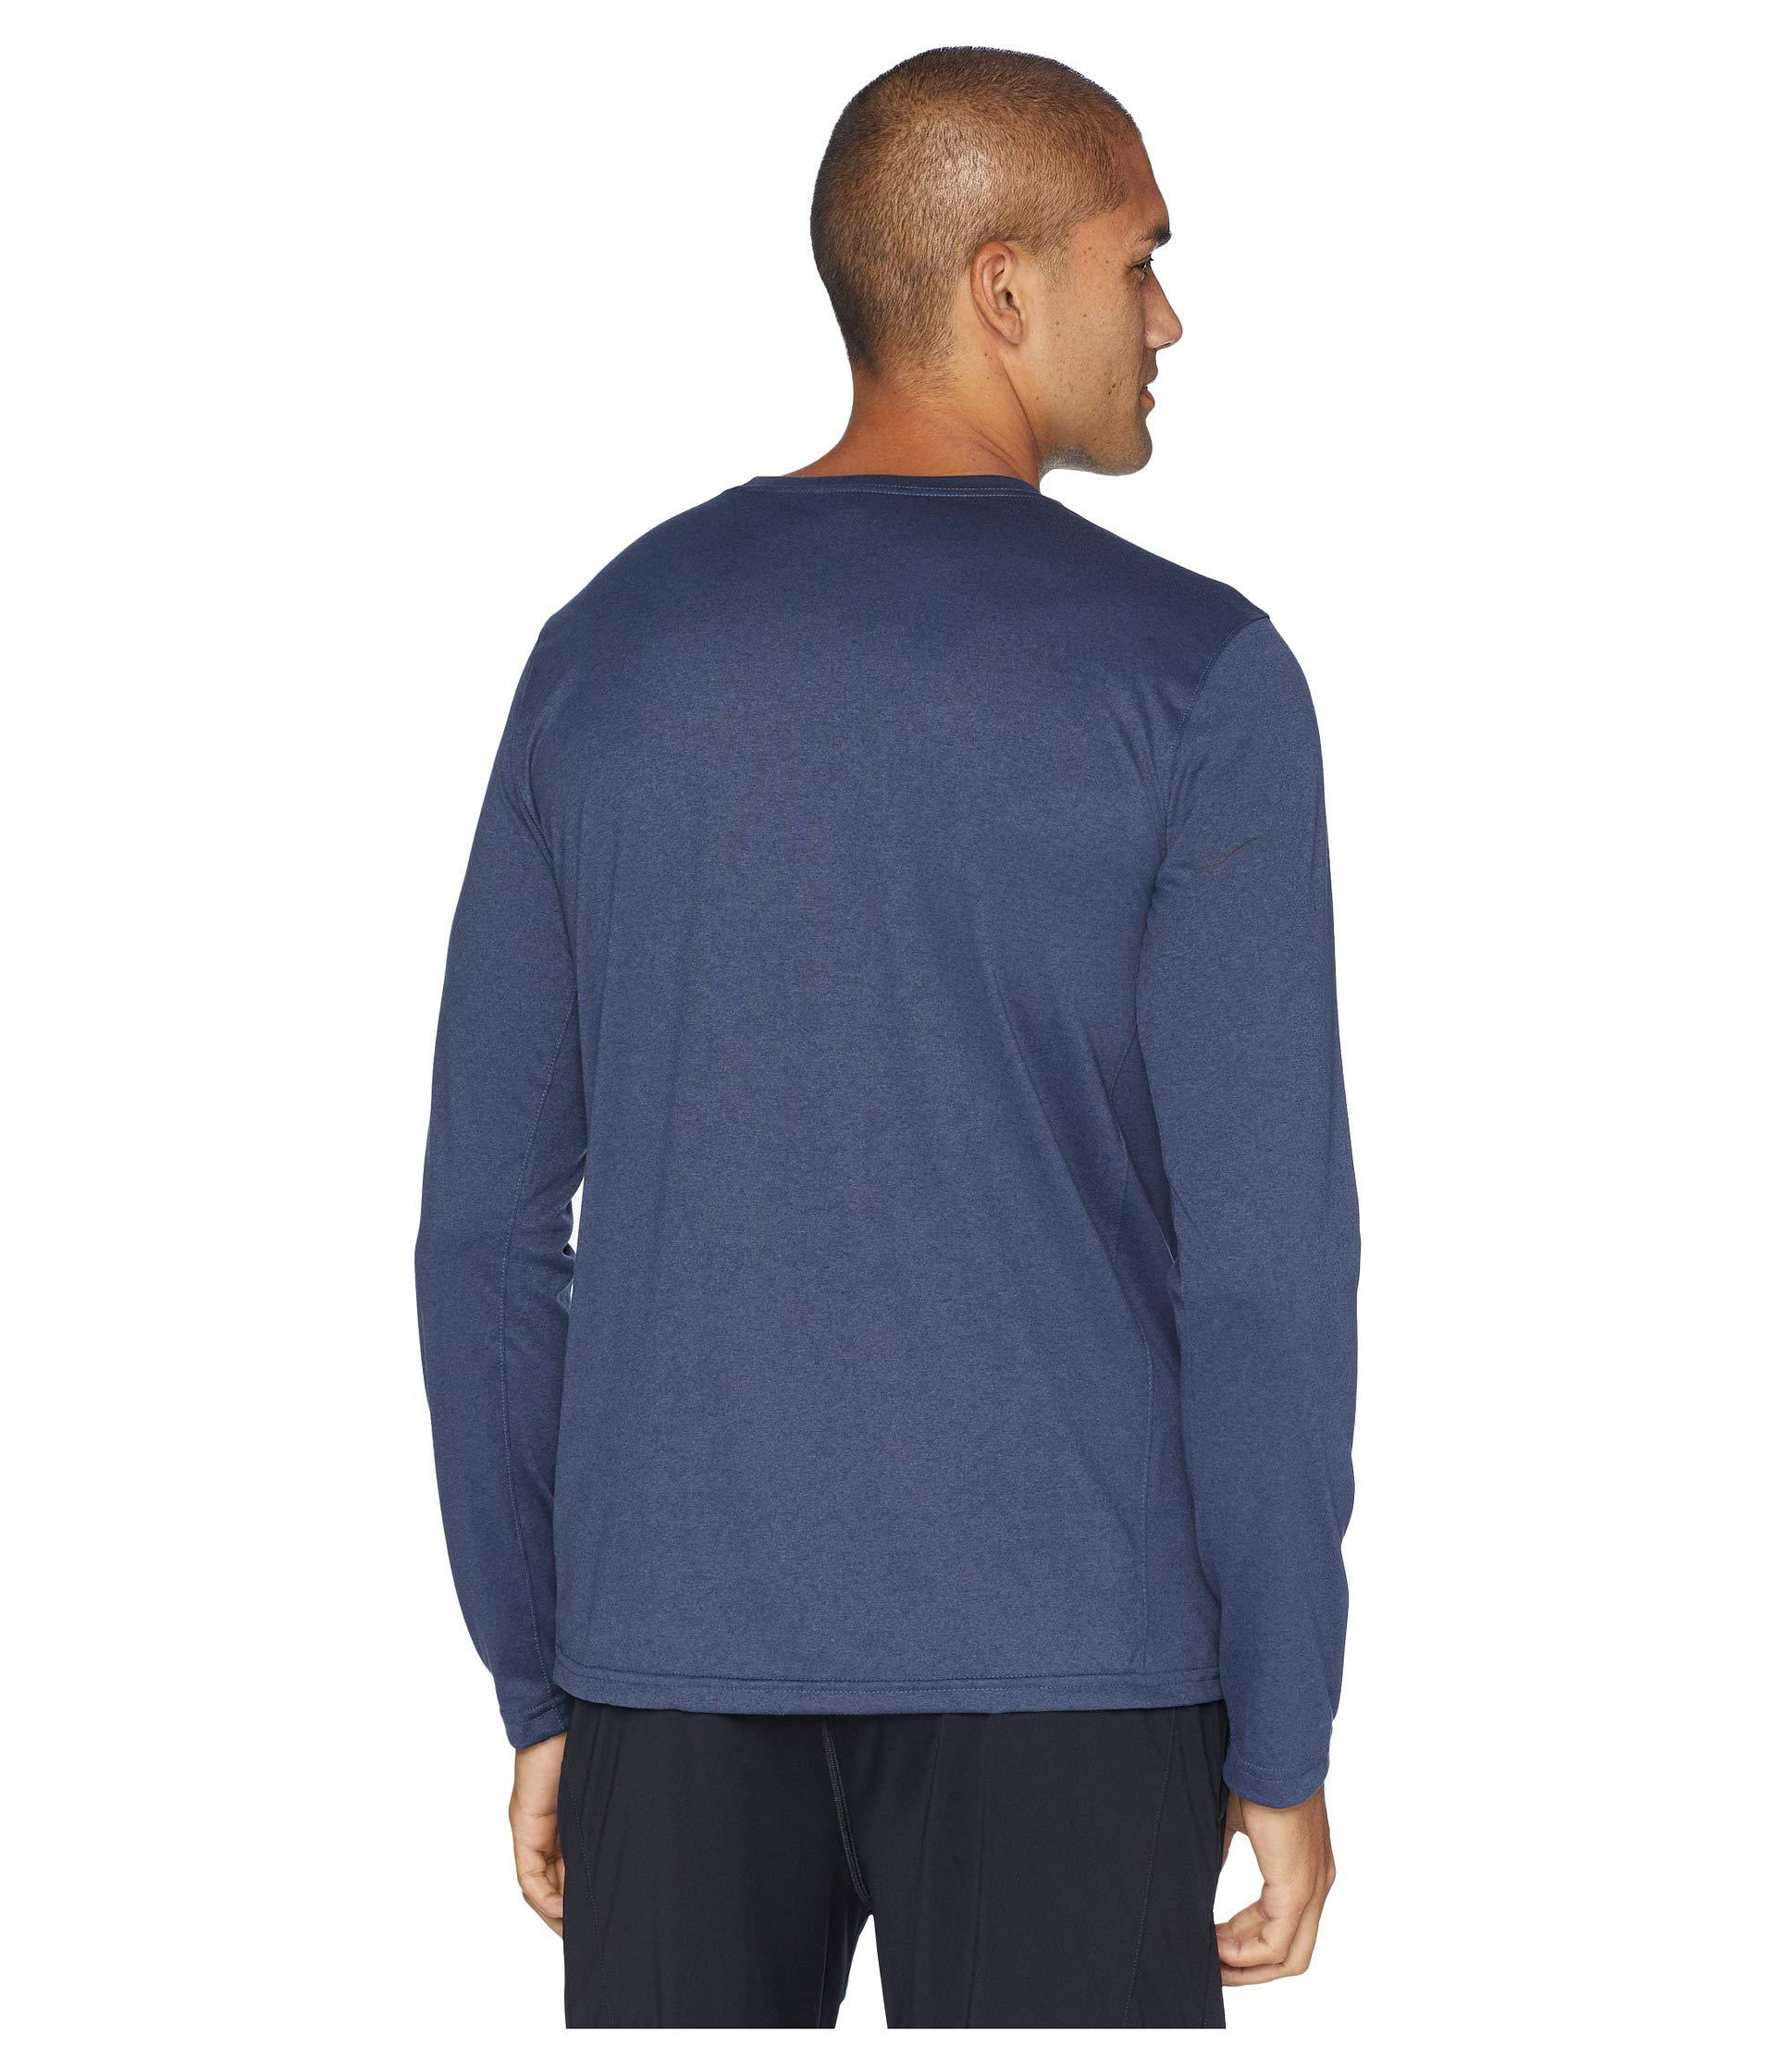 e3bbb59a Nike Tee Long 2 T 0 Lyst whiteblackblack Sleeve Legend Men's aWIYwqdq